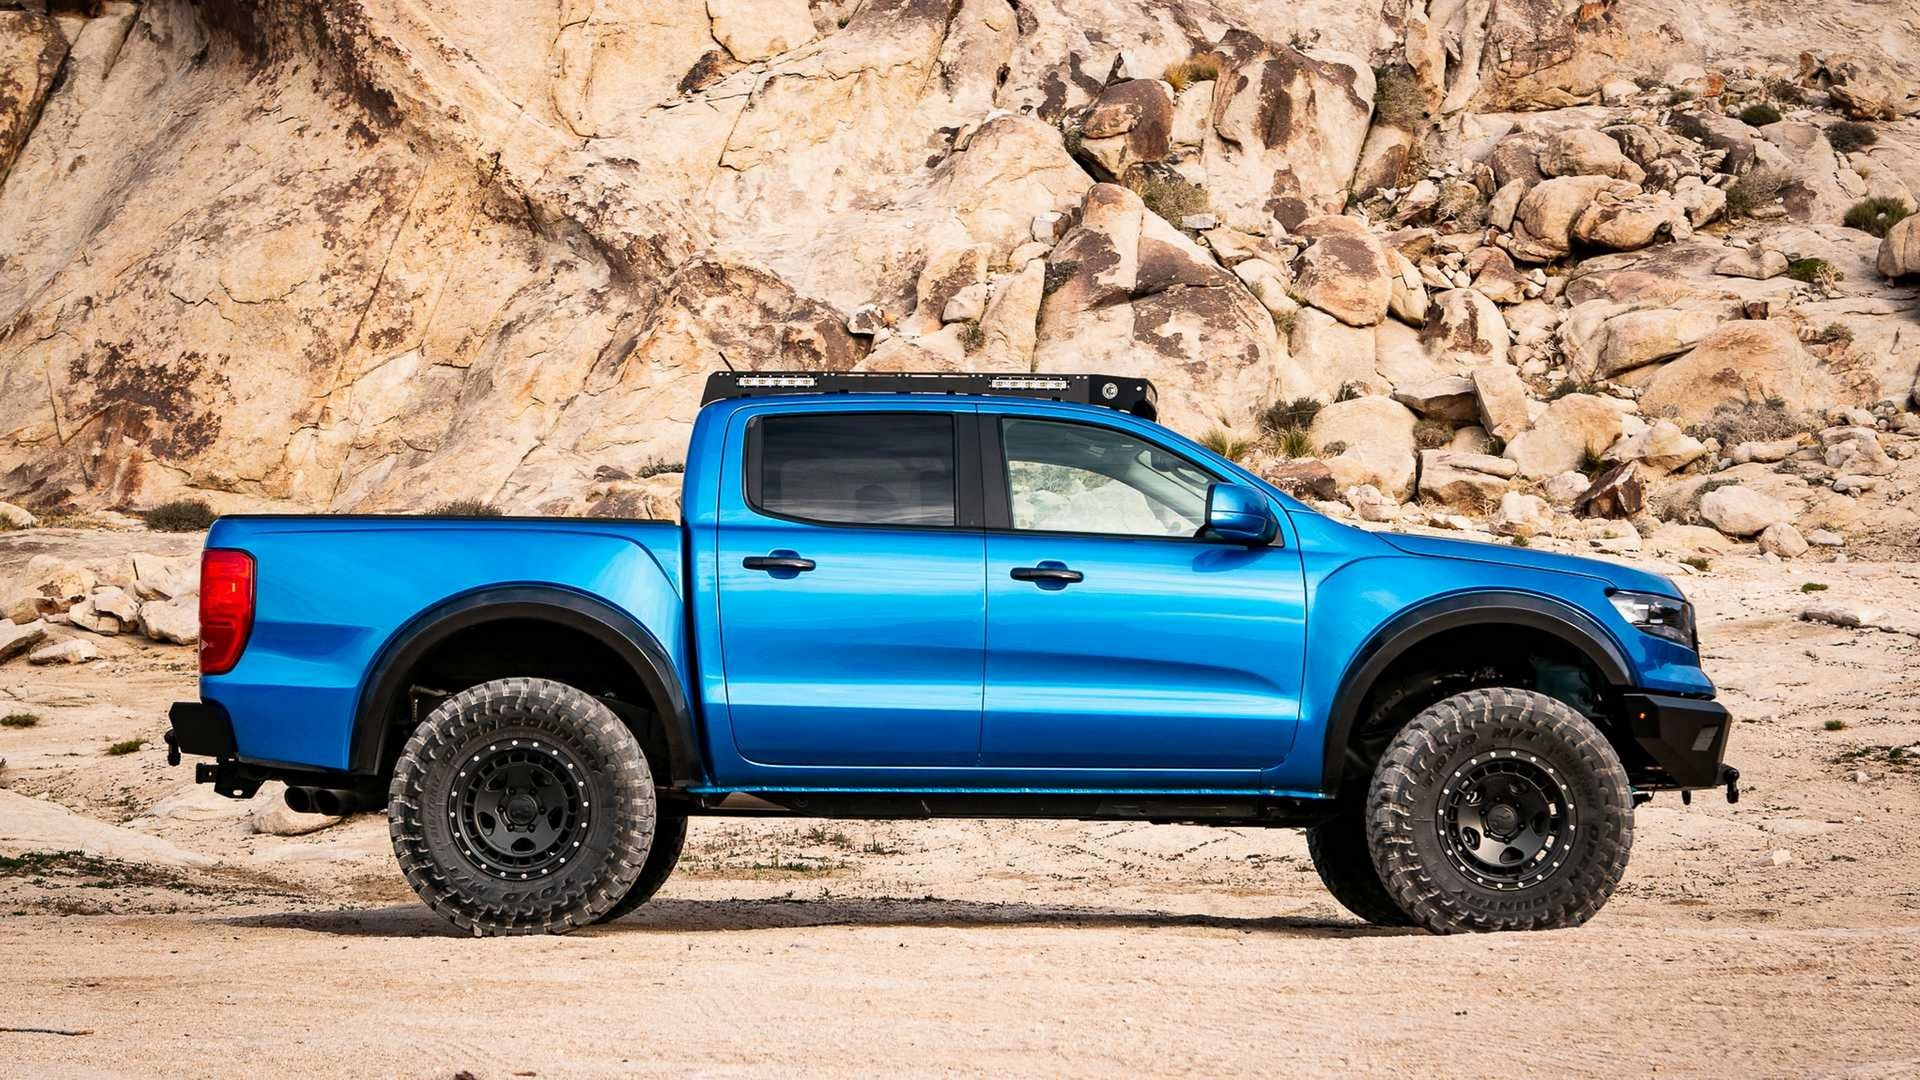 Ford-Ranger-Prorunner-By-APG-18